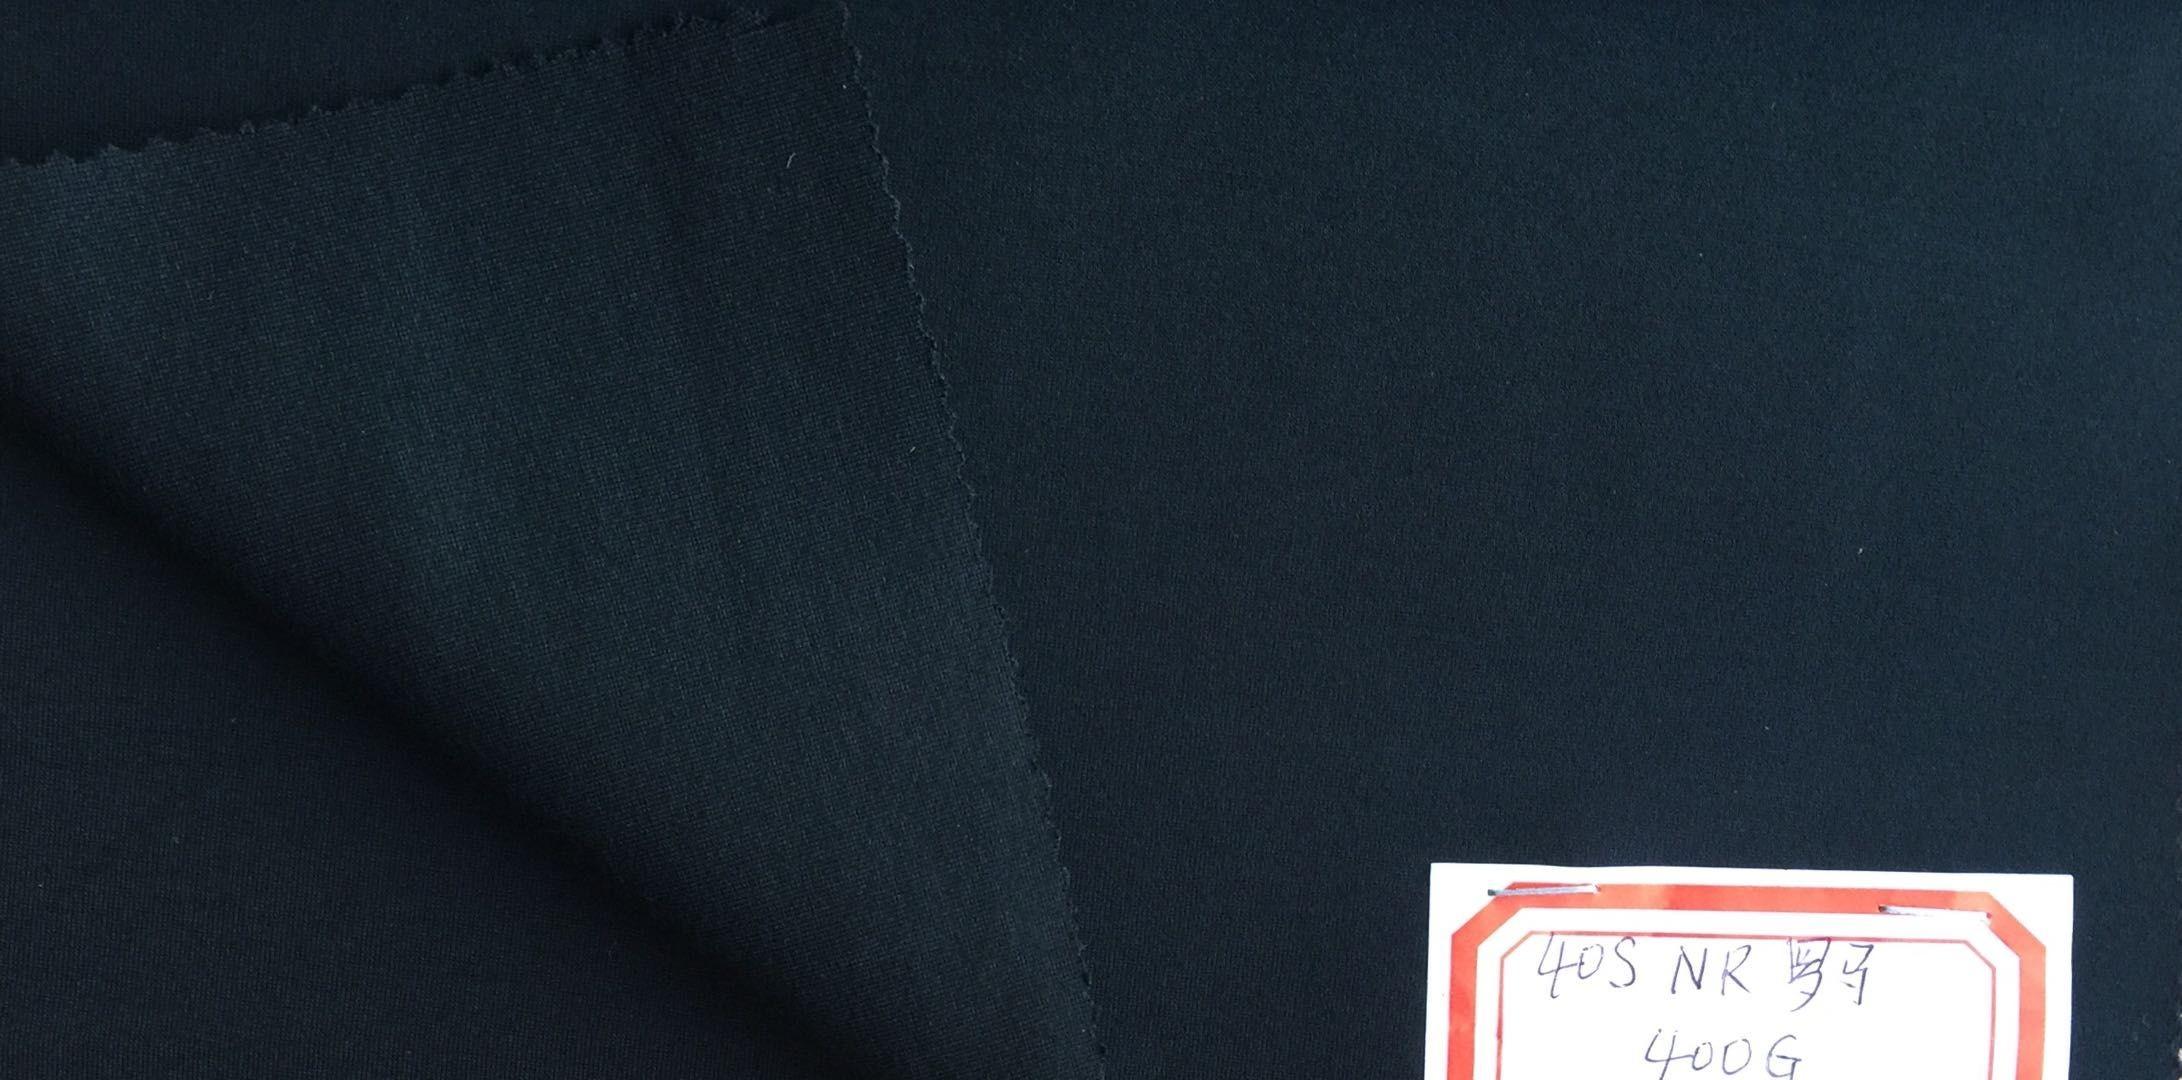 40sNR-roma fabric (black)